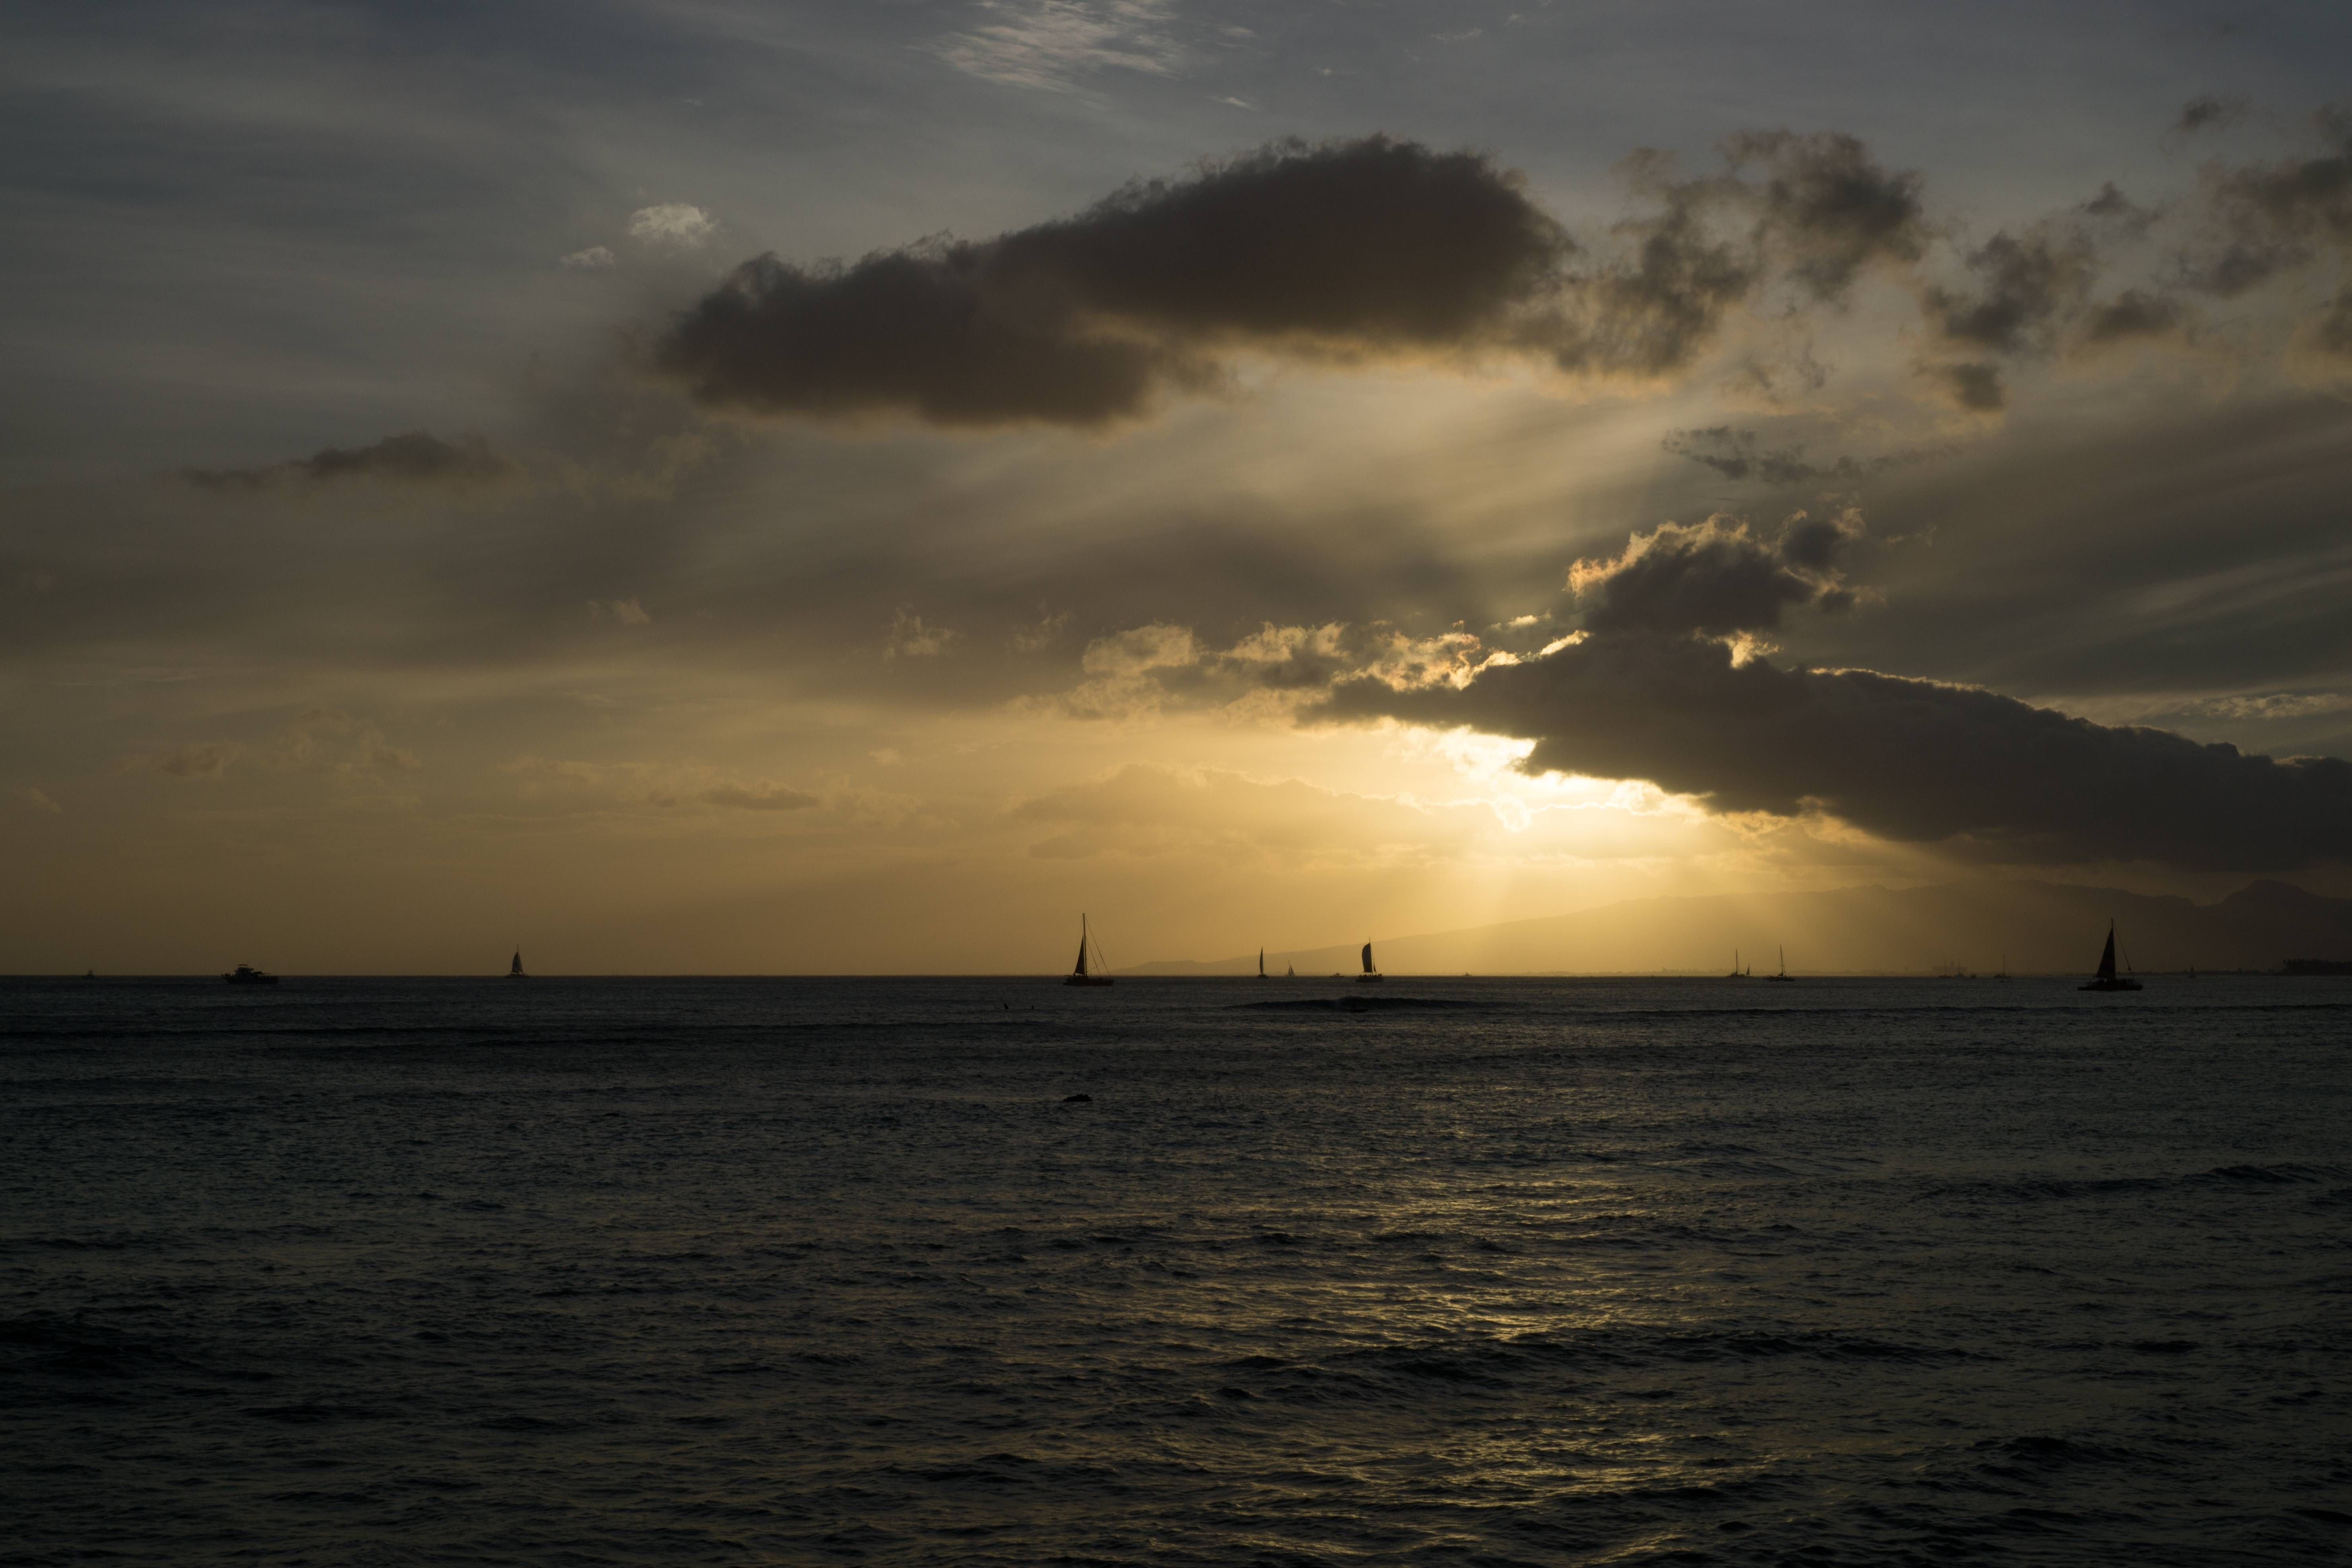 [OC]Sunset in Oahu Hawaii [6000x4000]